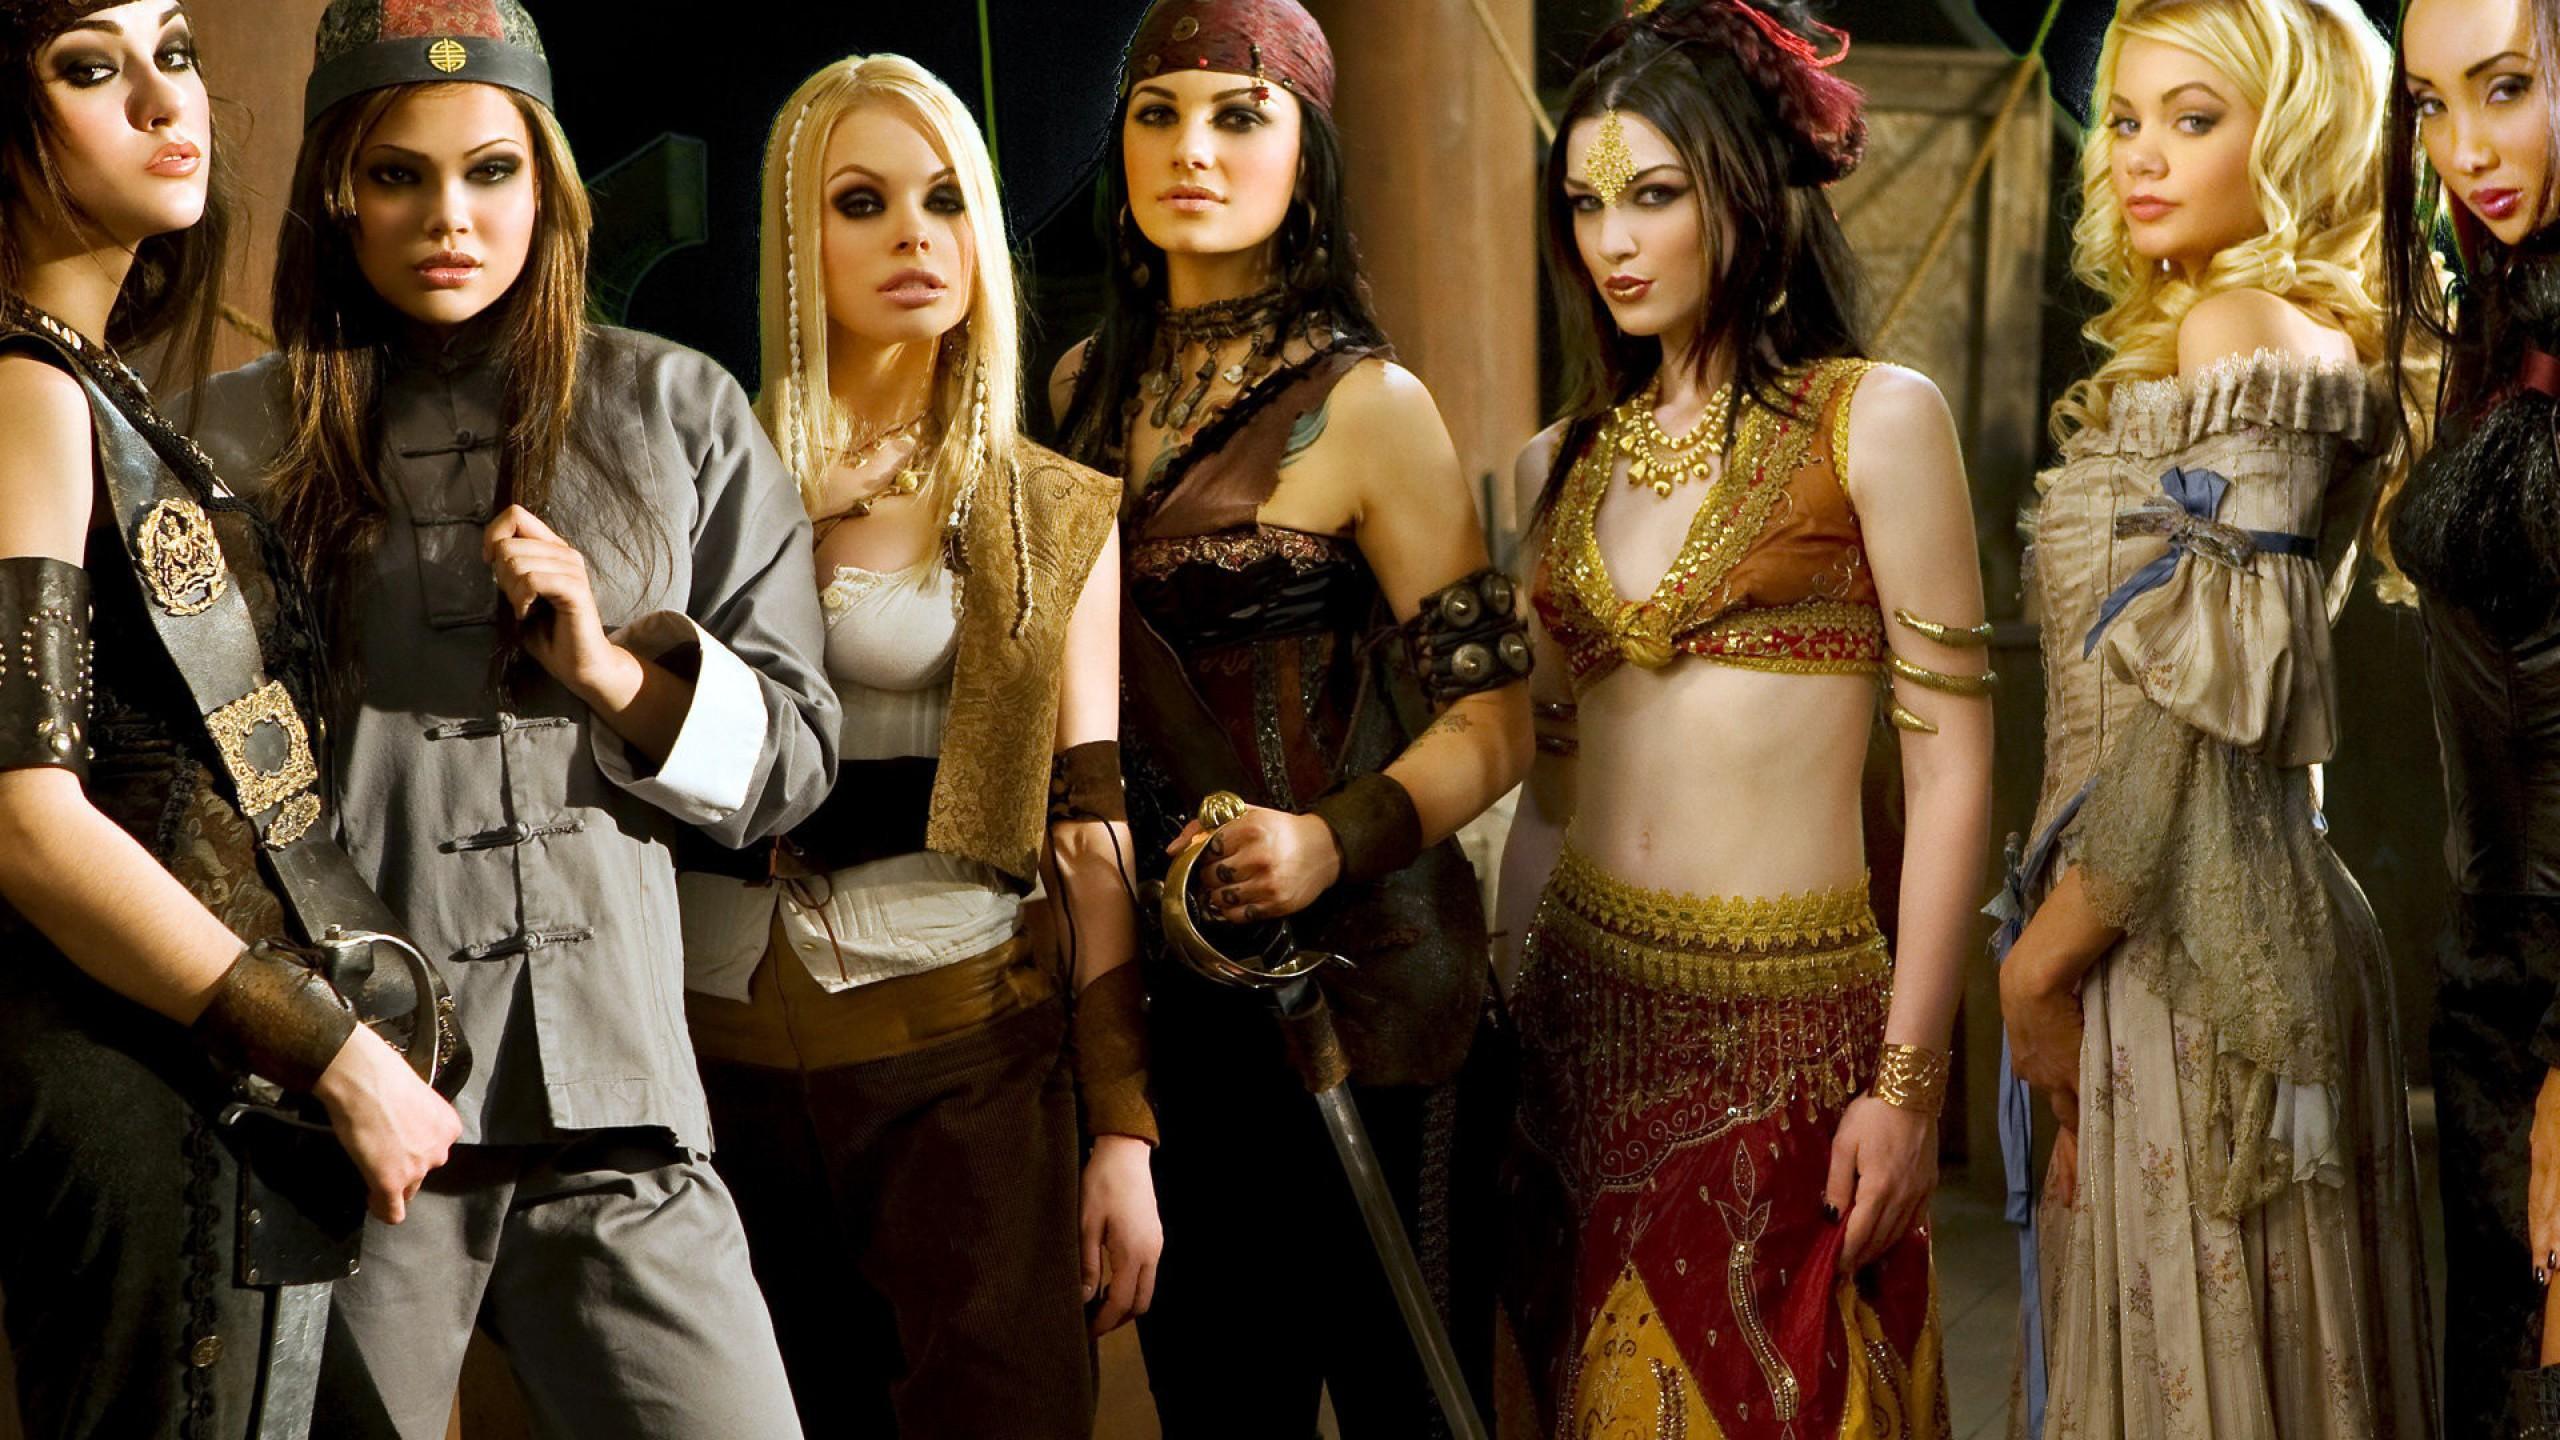 Pirates_2005_dvd_pic001 Jpg